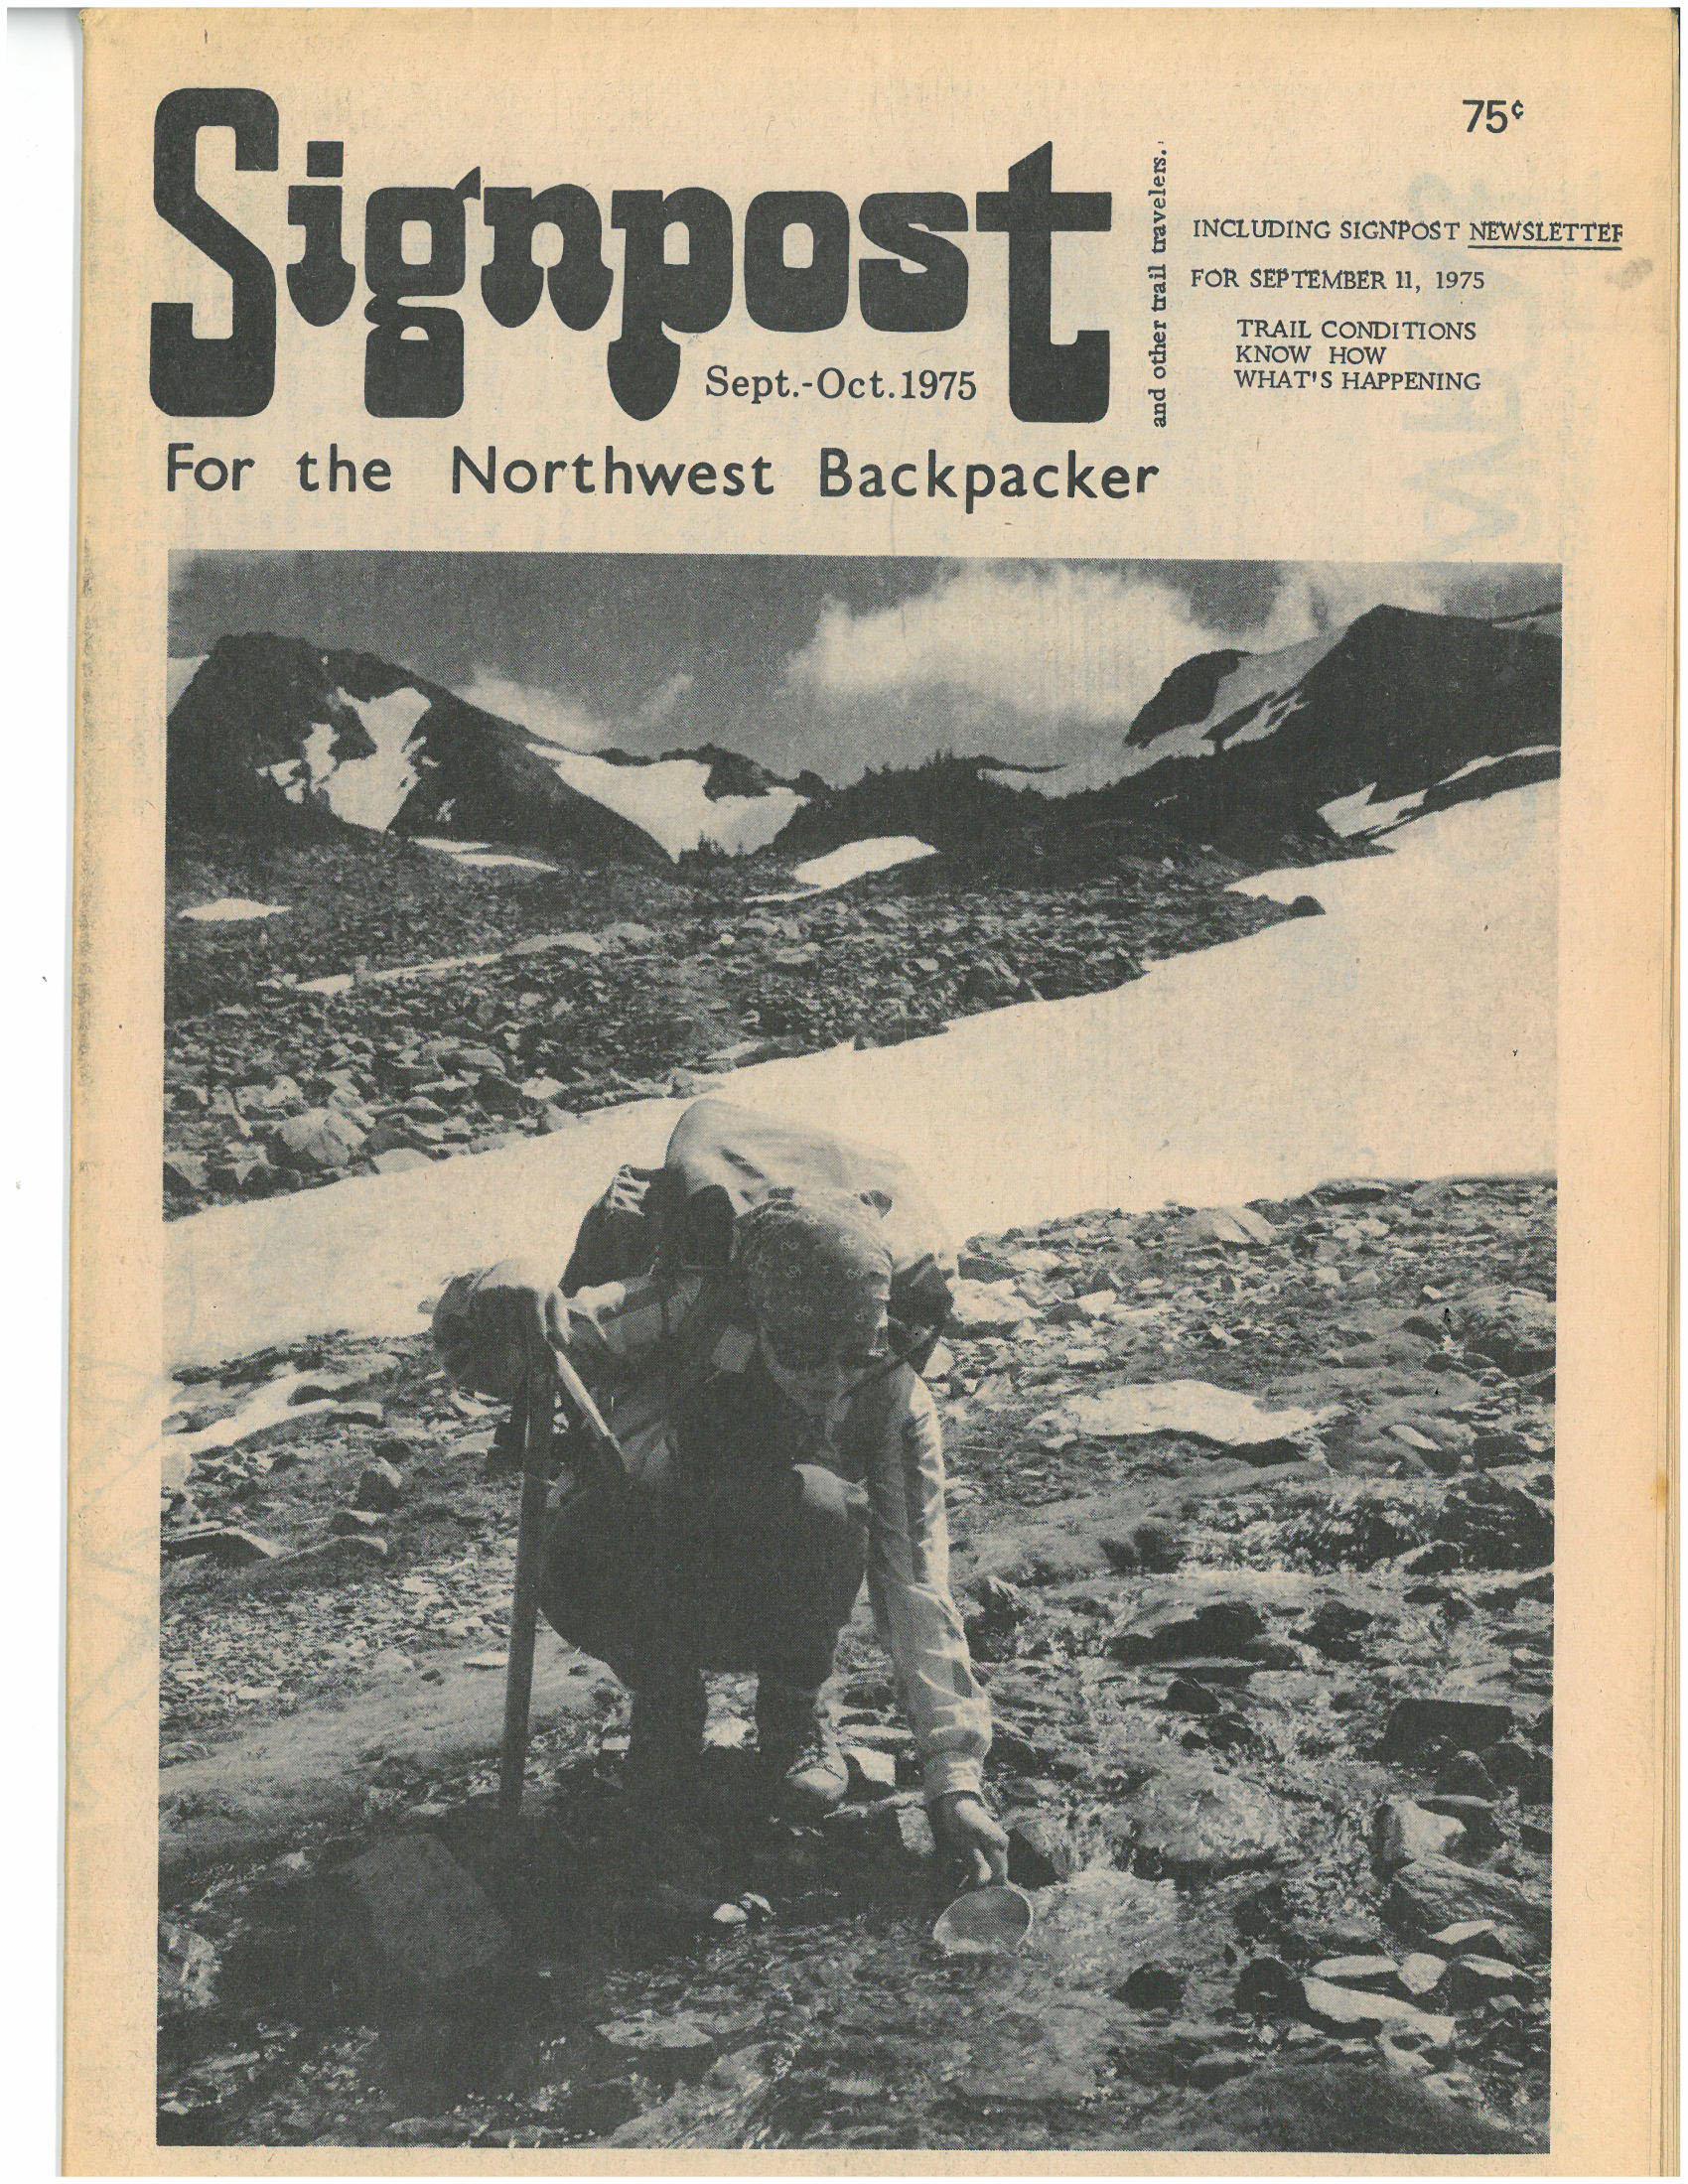 1975 Oct-Sept issue